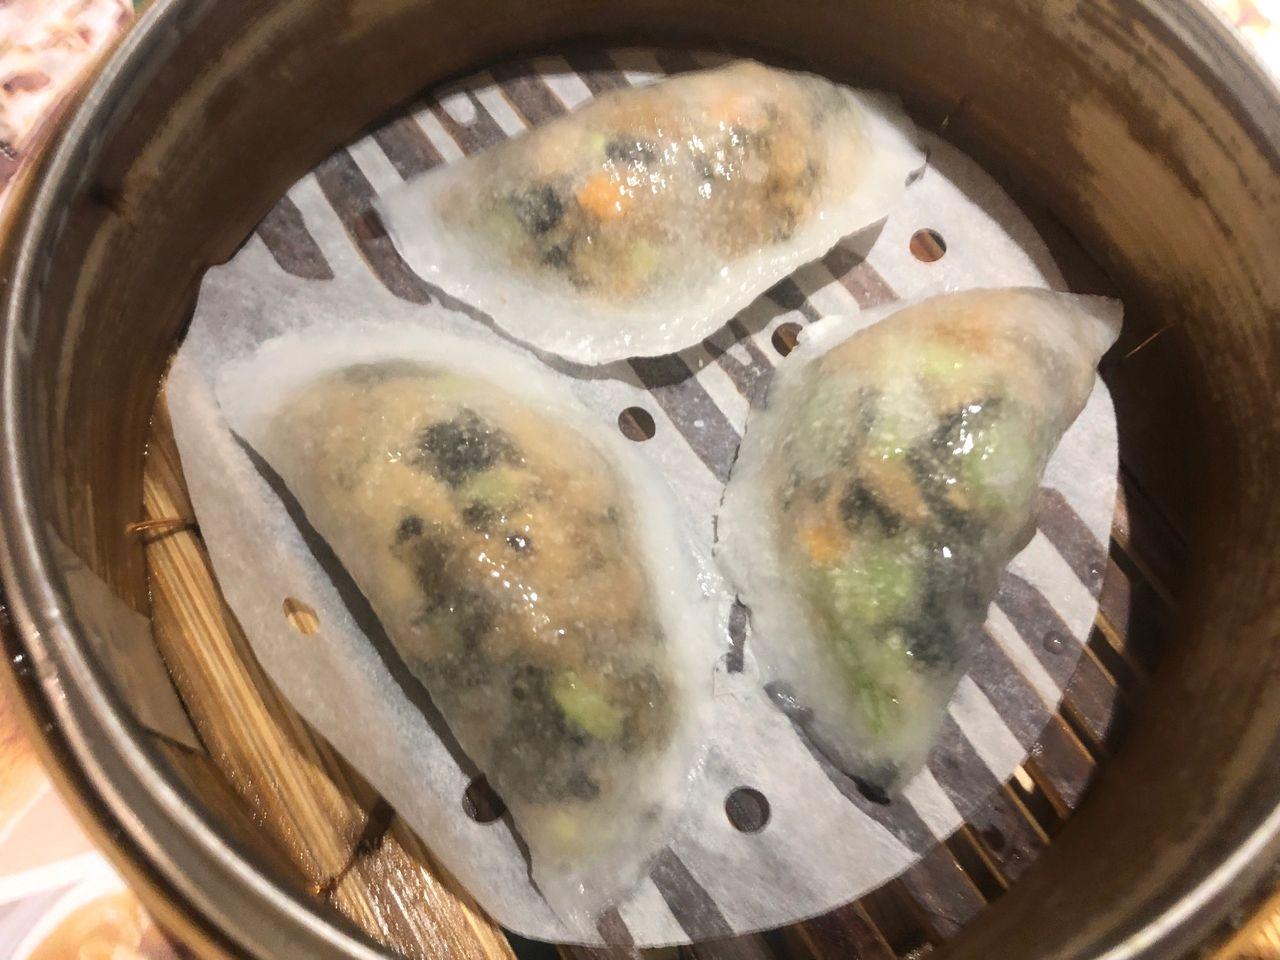 Tim Ho Wan's steamed vegetable dumplings.